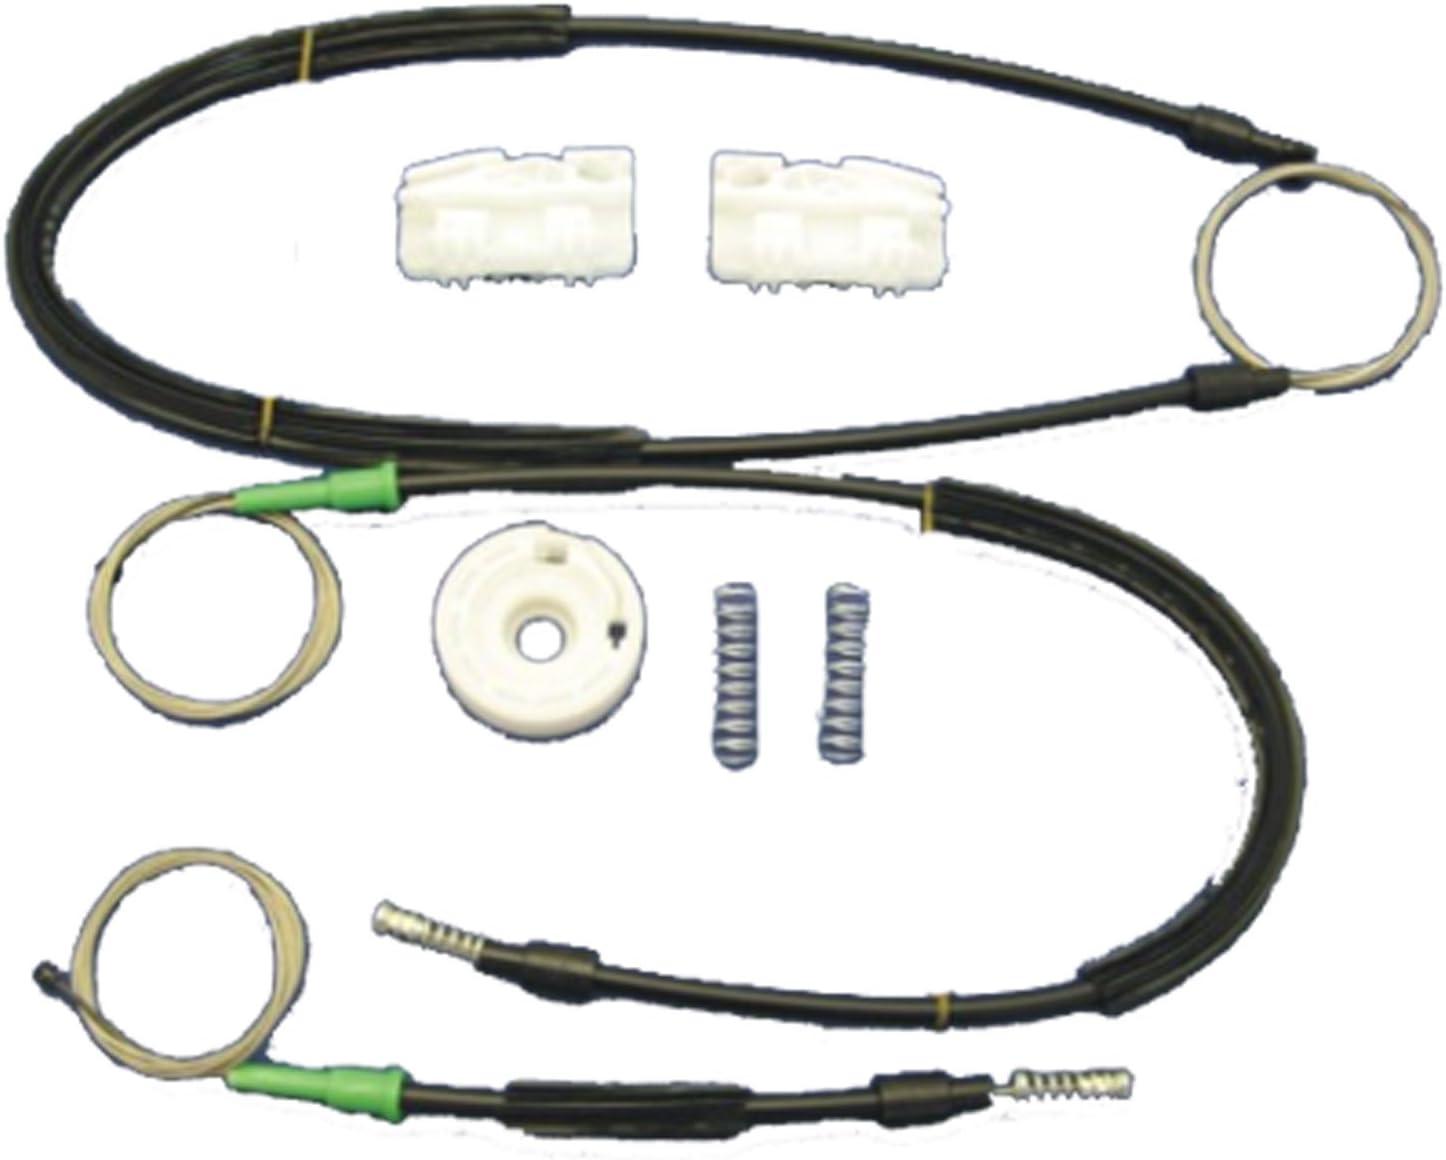 Landrover Freelander Window Regulator Repair Kit With Cables Rear Left Door